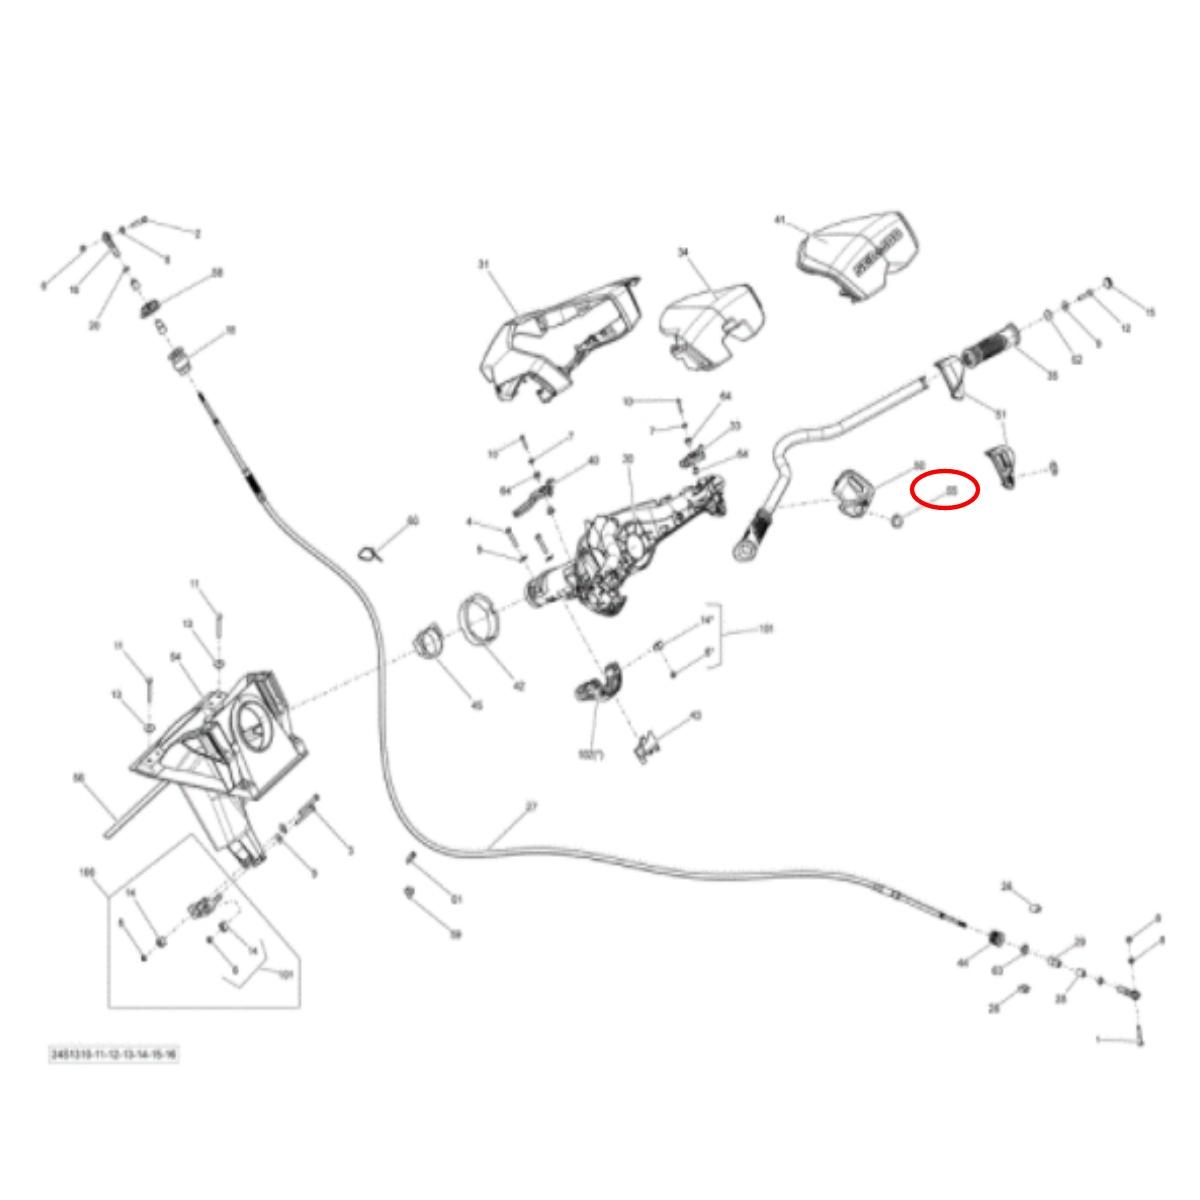 Capa de Botão Start/Stop Jetski Sea Doo 4 Tec Redonda  - Radical Peças - Peças para Jet Ski